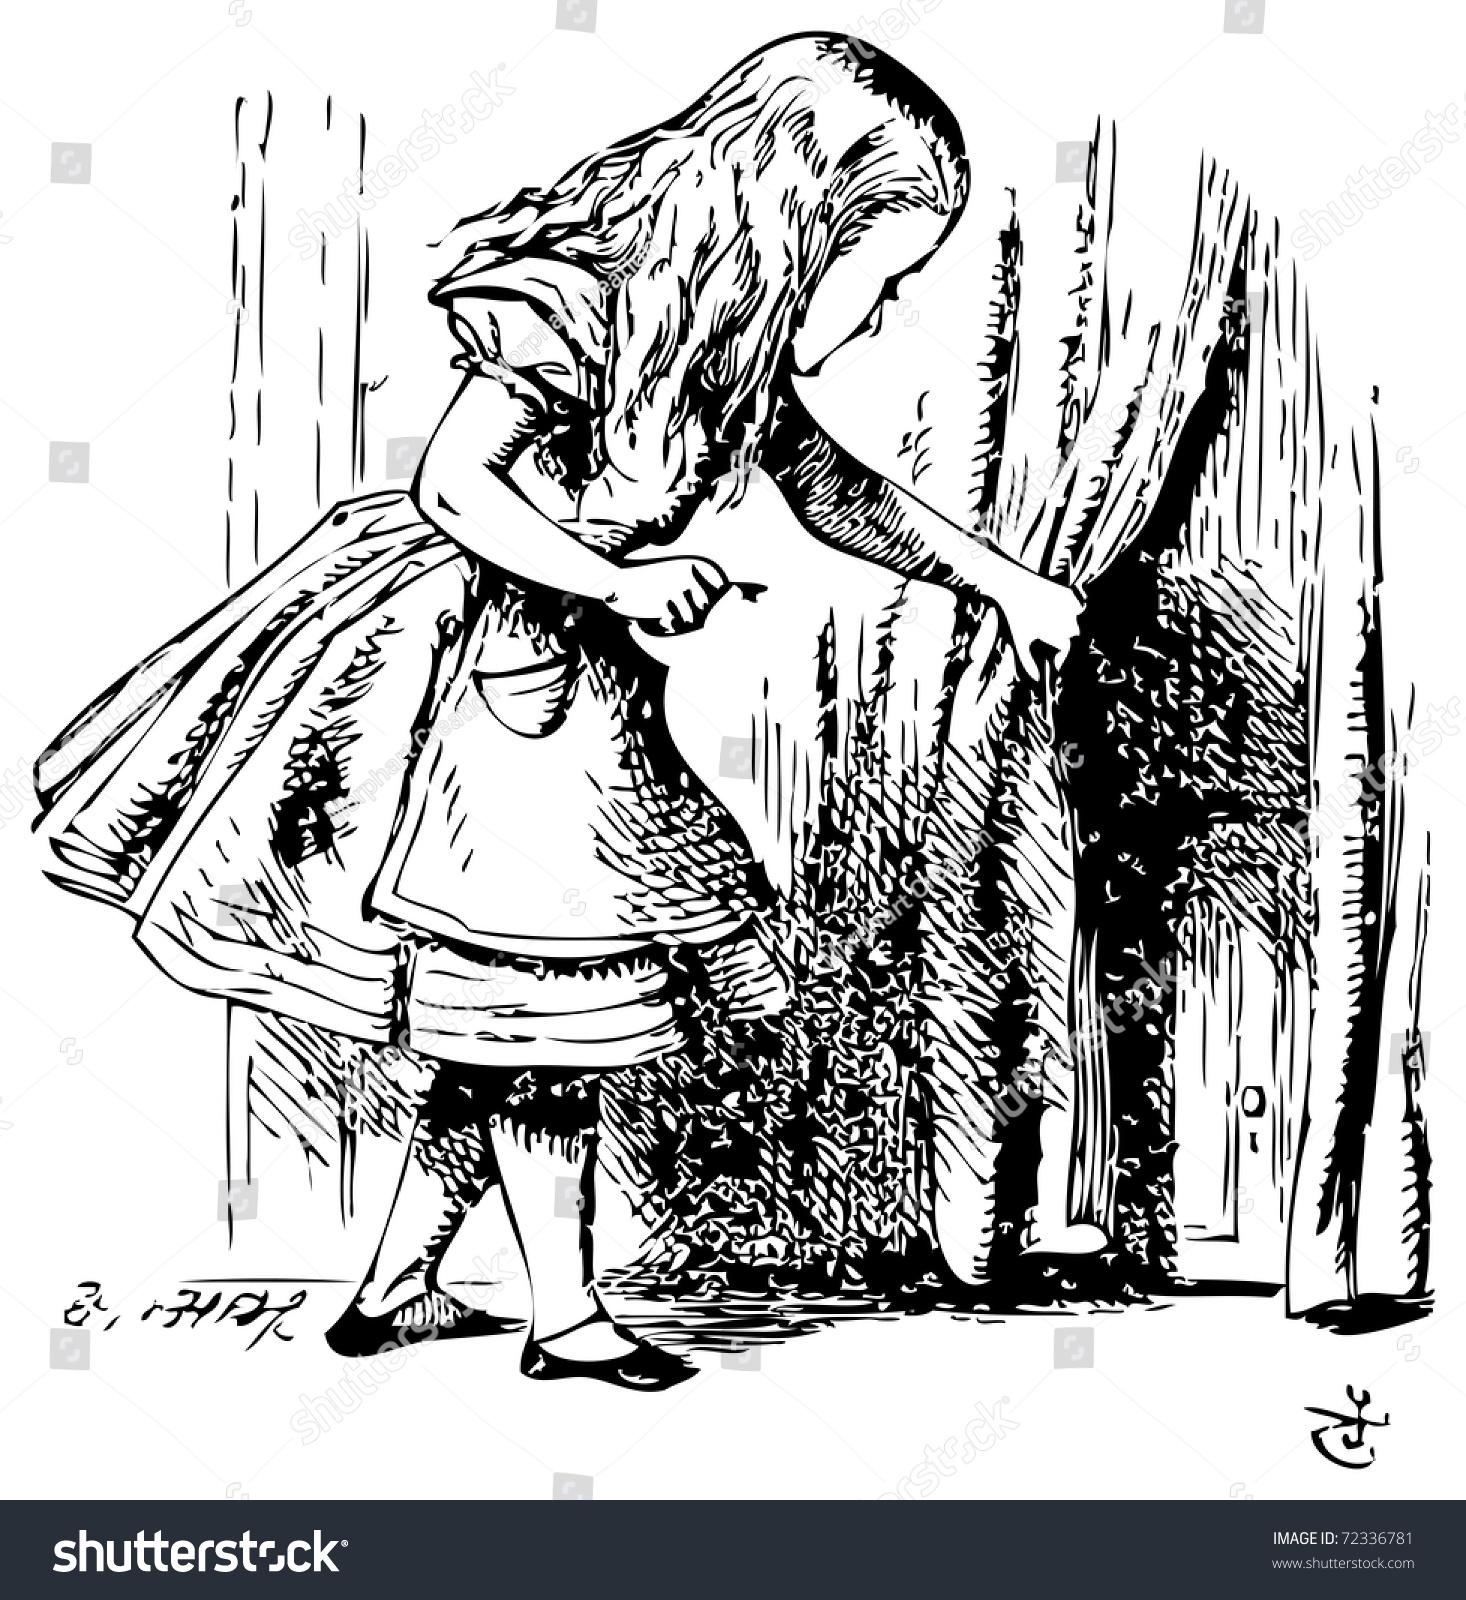 Alice in Wonderland. Alice is looking behind a curtain to reveal a hidden door  sc 1 st  Shutterstock & Alice Wonderland Alice Looking Behind Curtain Stock Vector ... pezcame.com